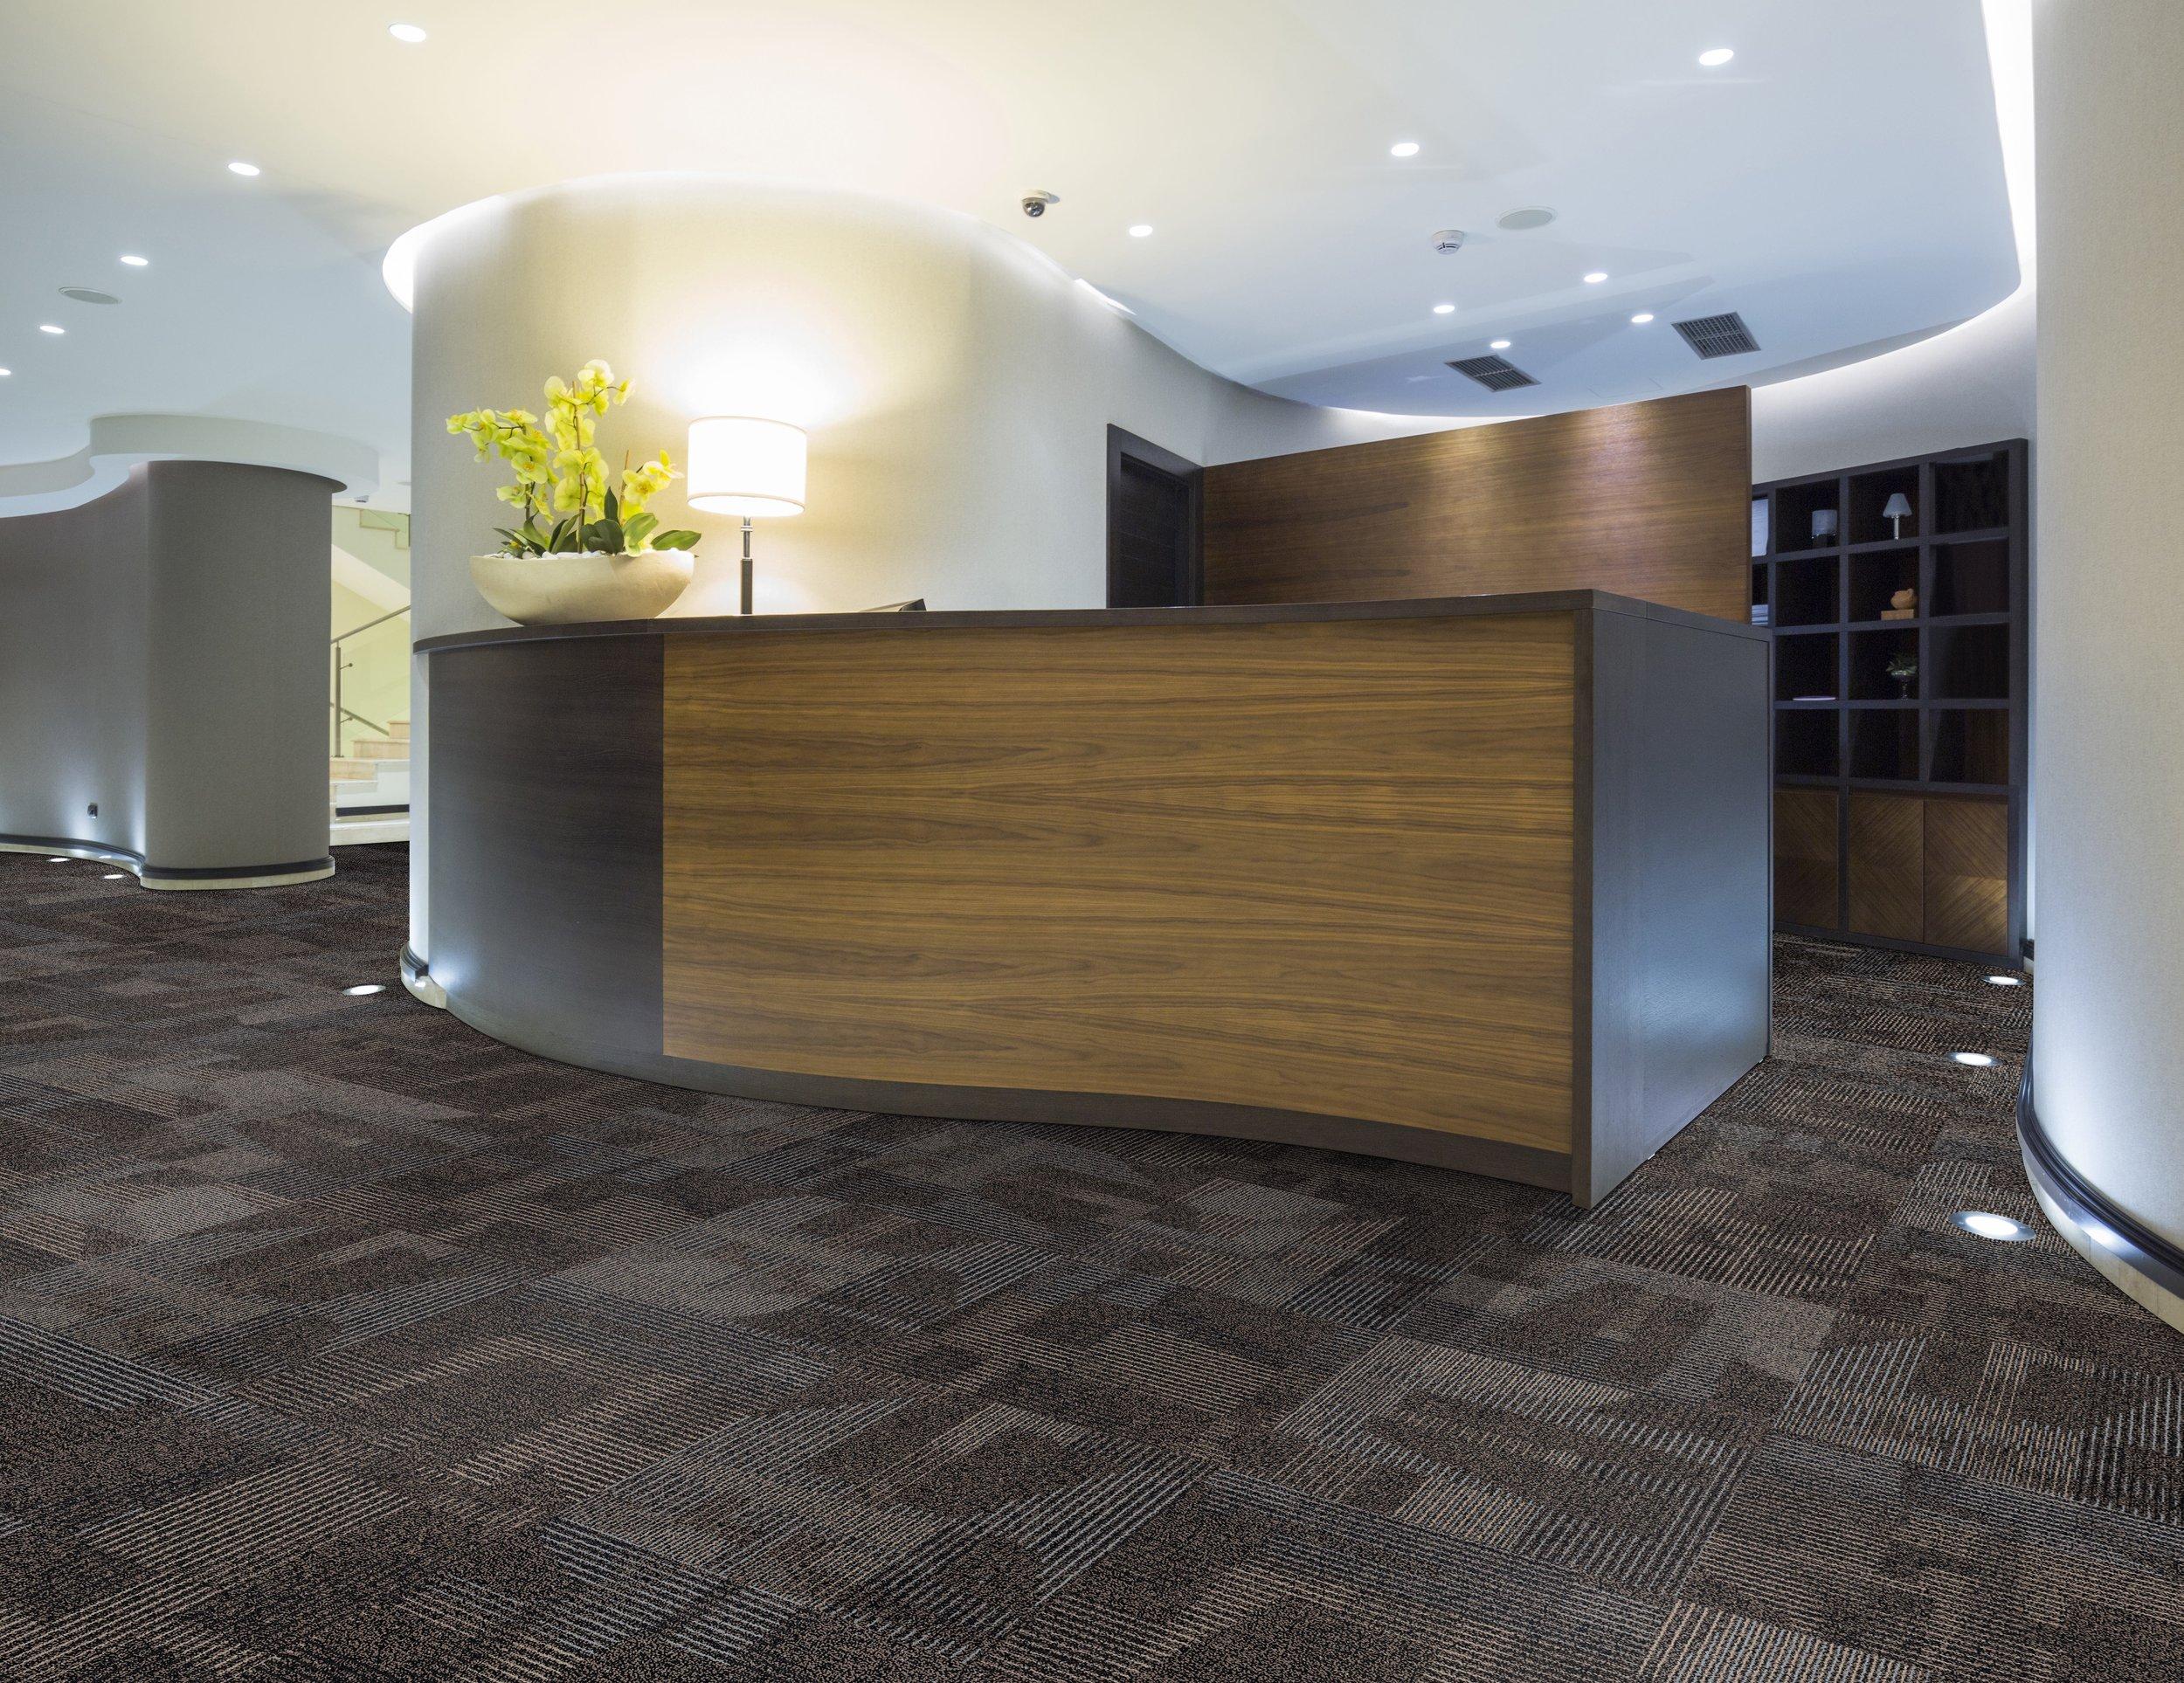 WHISKEY — 50136 Quarter Turn installation